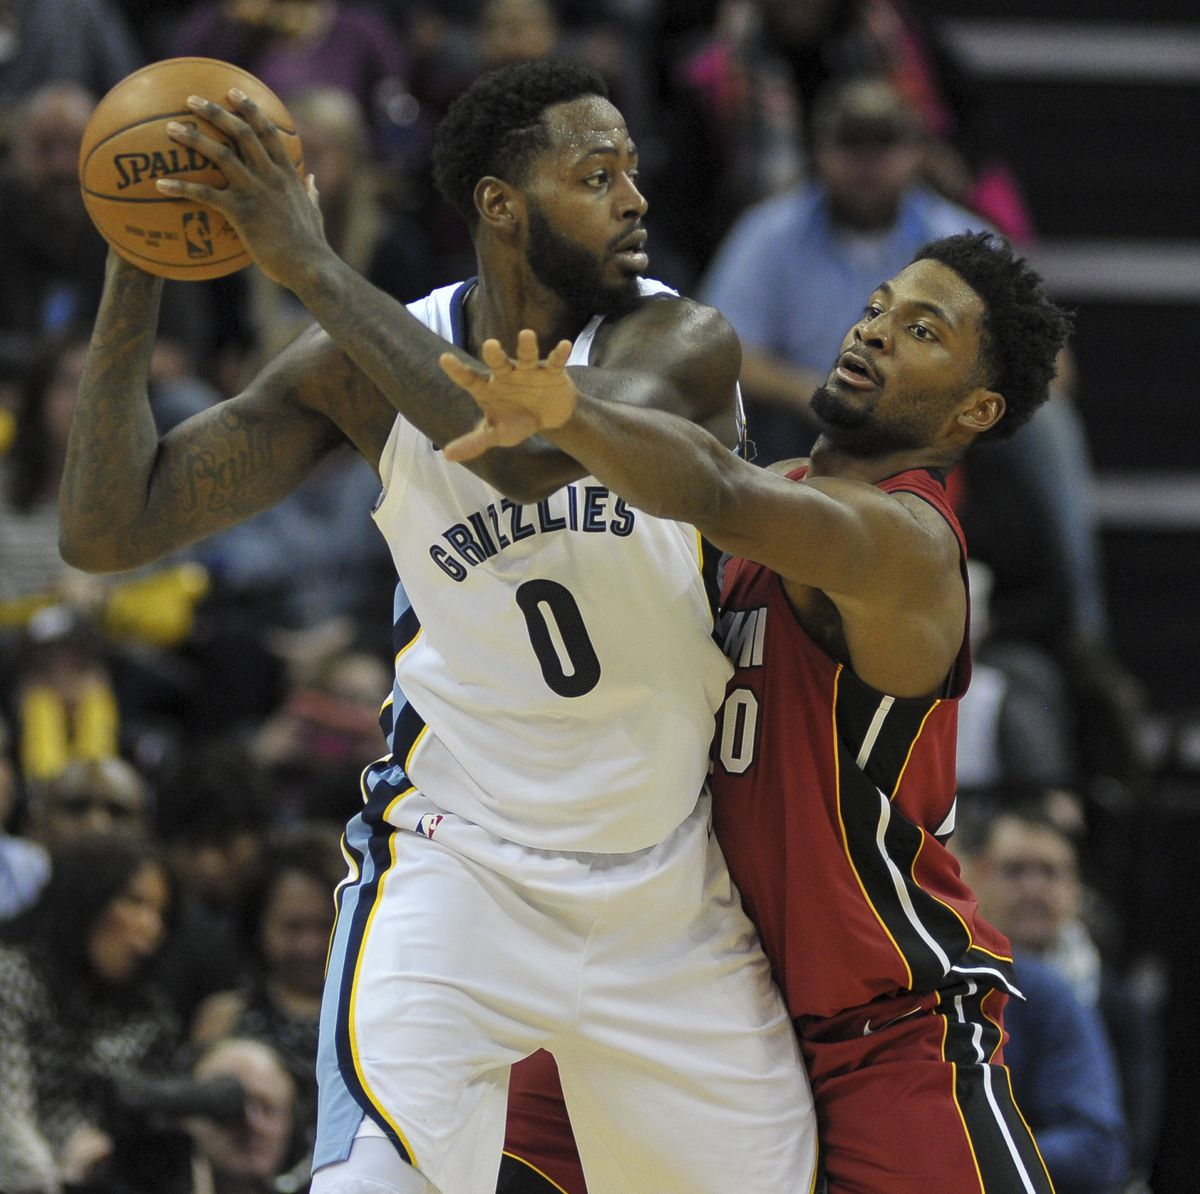 NBA: Miami Heat at Memphis Grizzlies